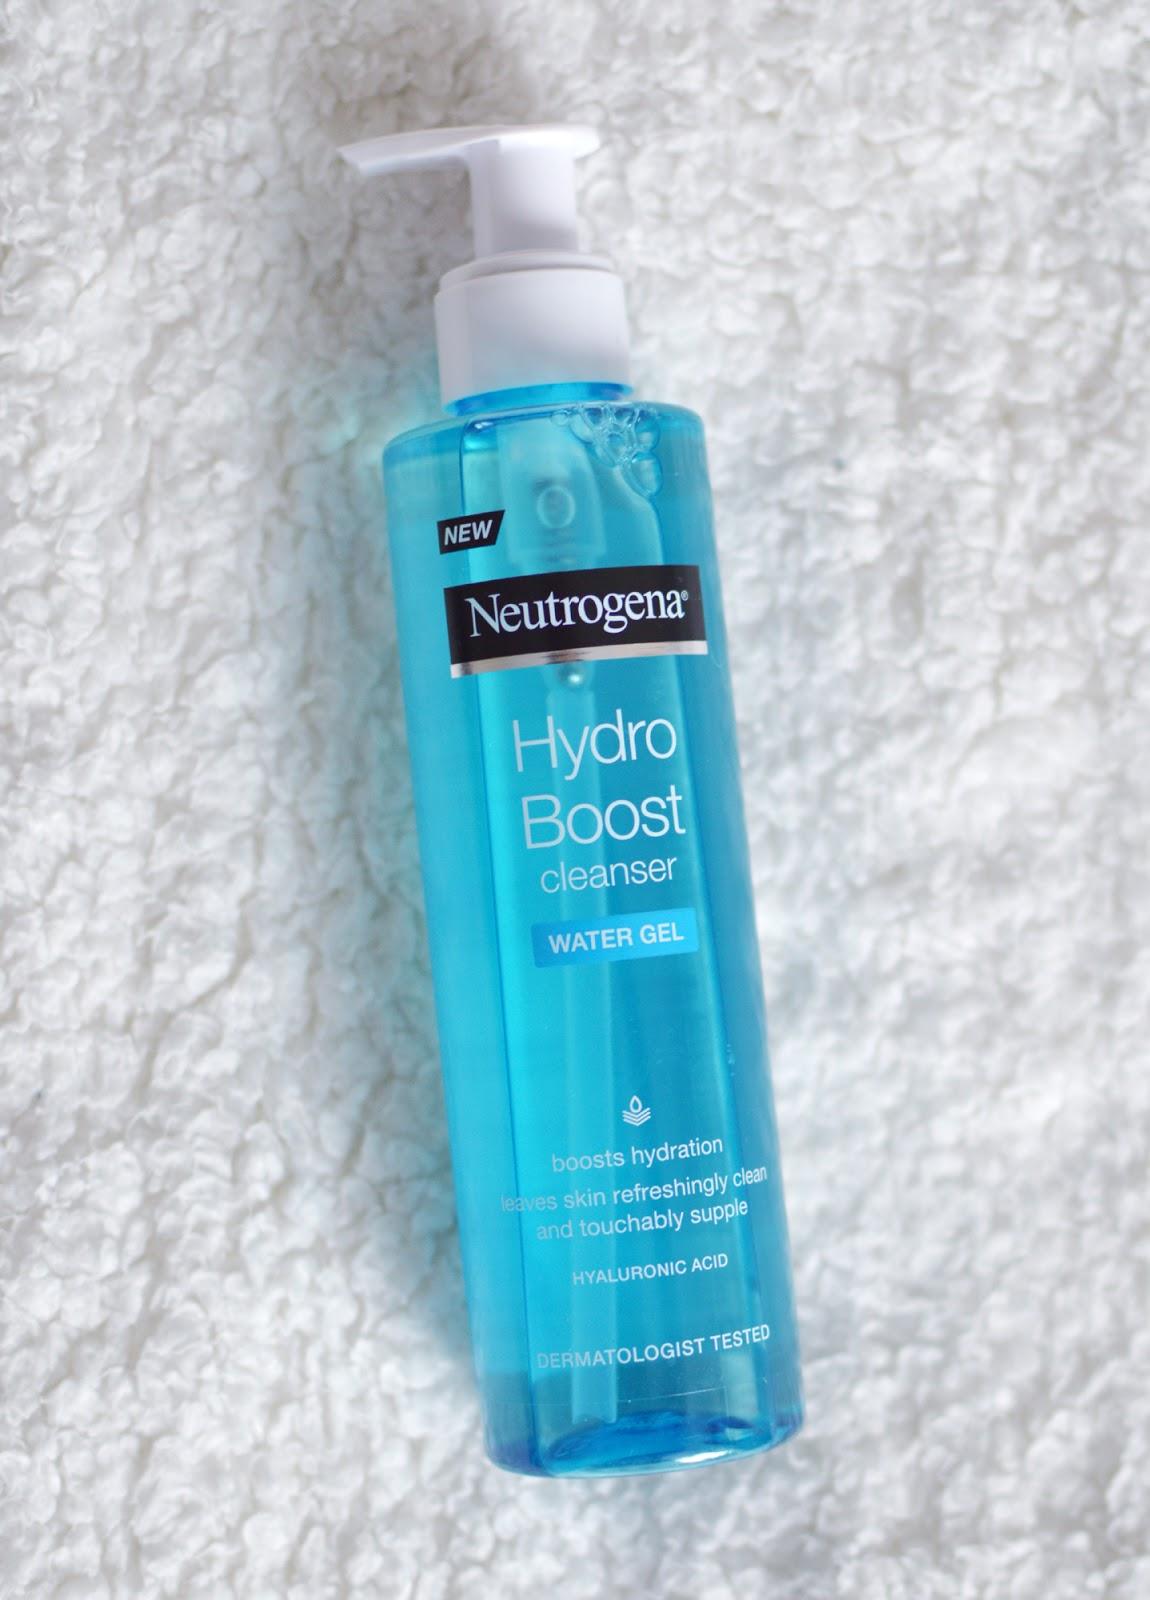 Neutrogena Hydro Boost Water Gel Cleanser